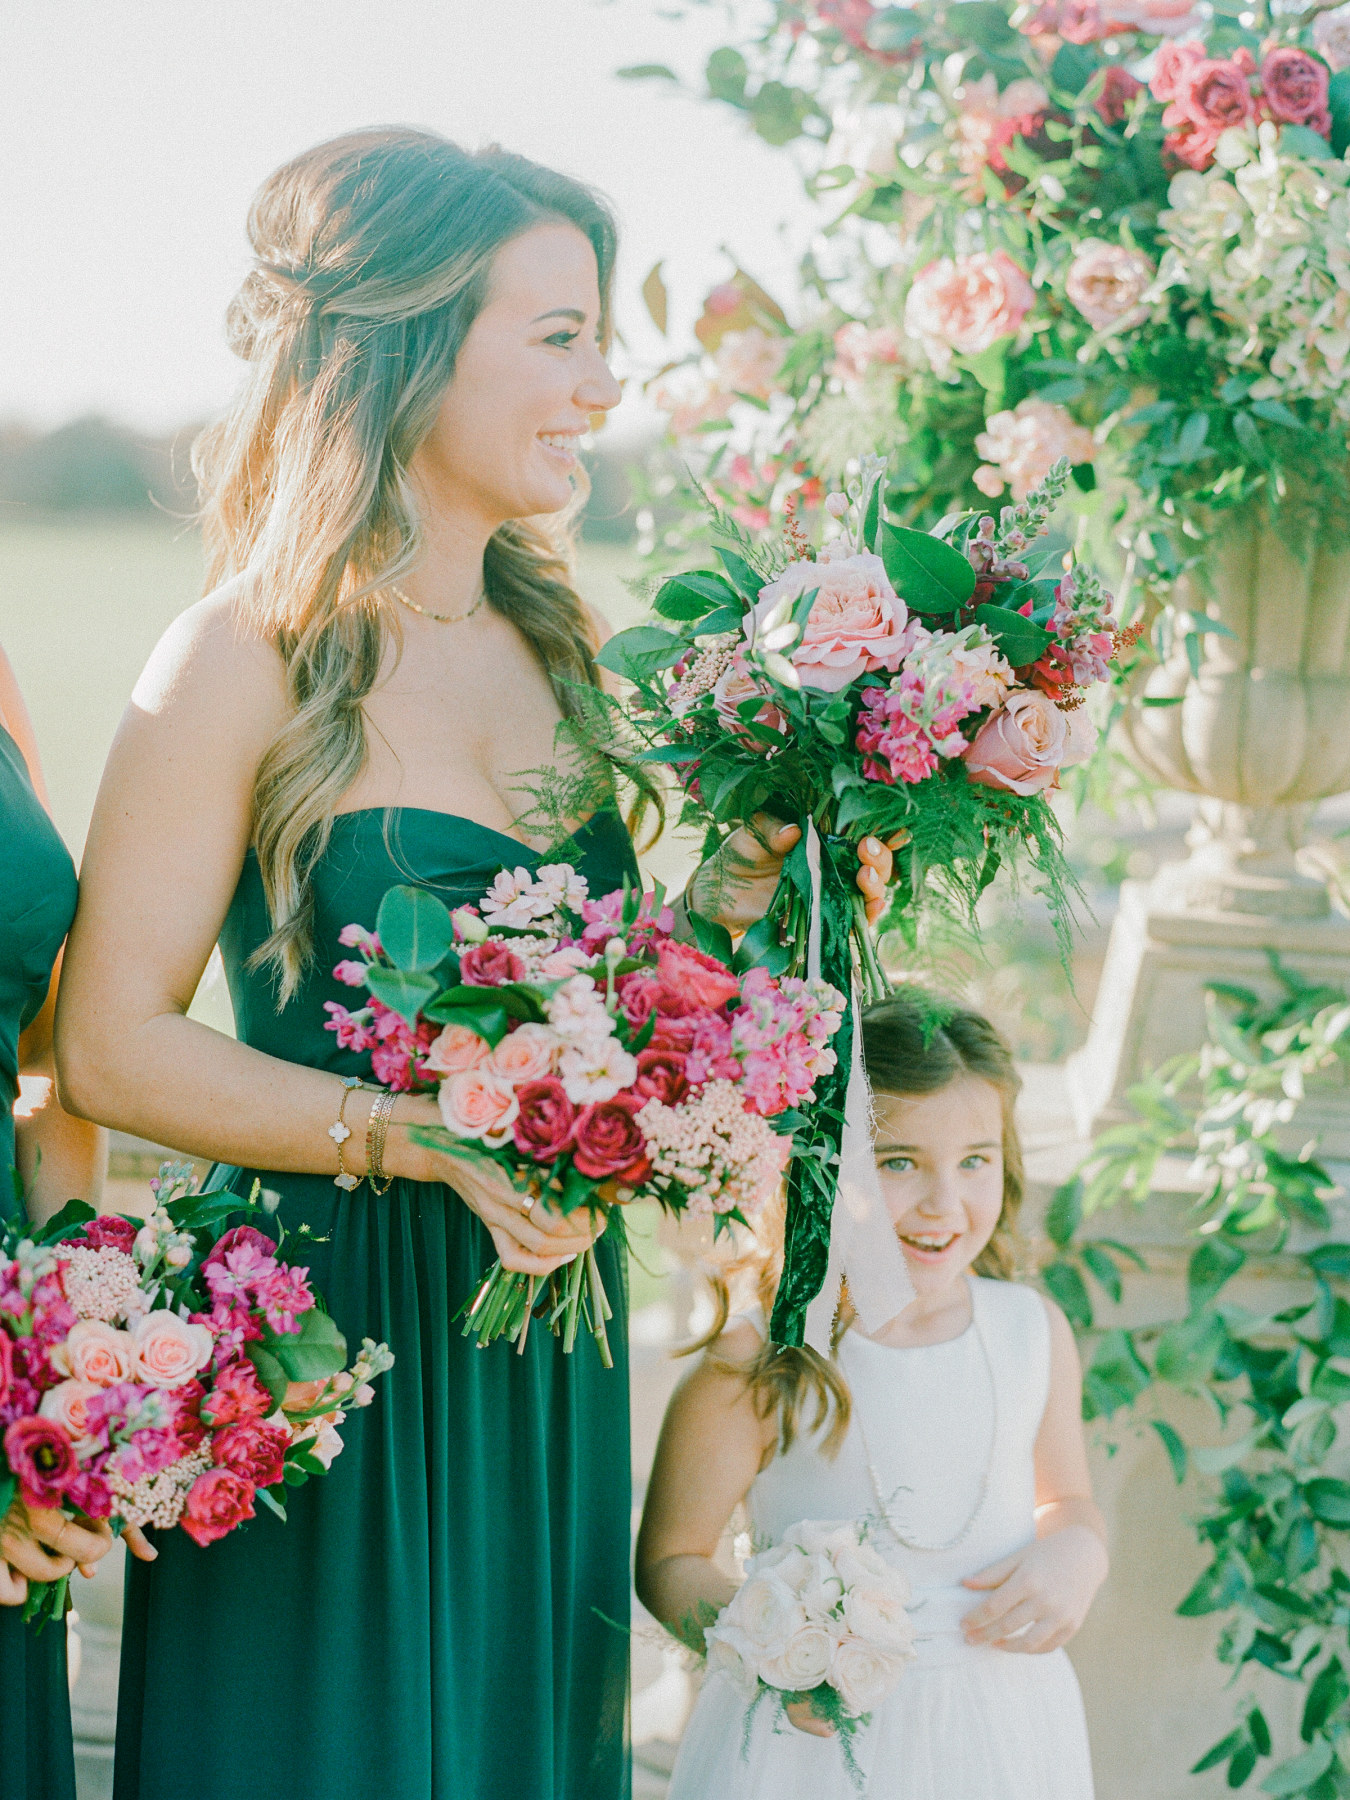 29Great_Marsh_Estates_Wedding_Anne_Kelley_Events_Astrid_Photography146486100011-2